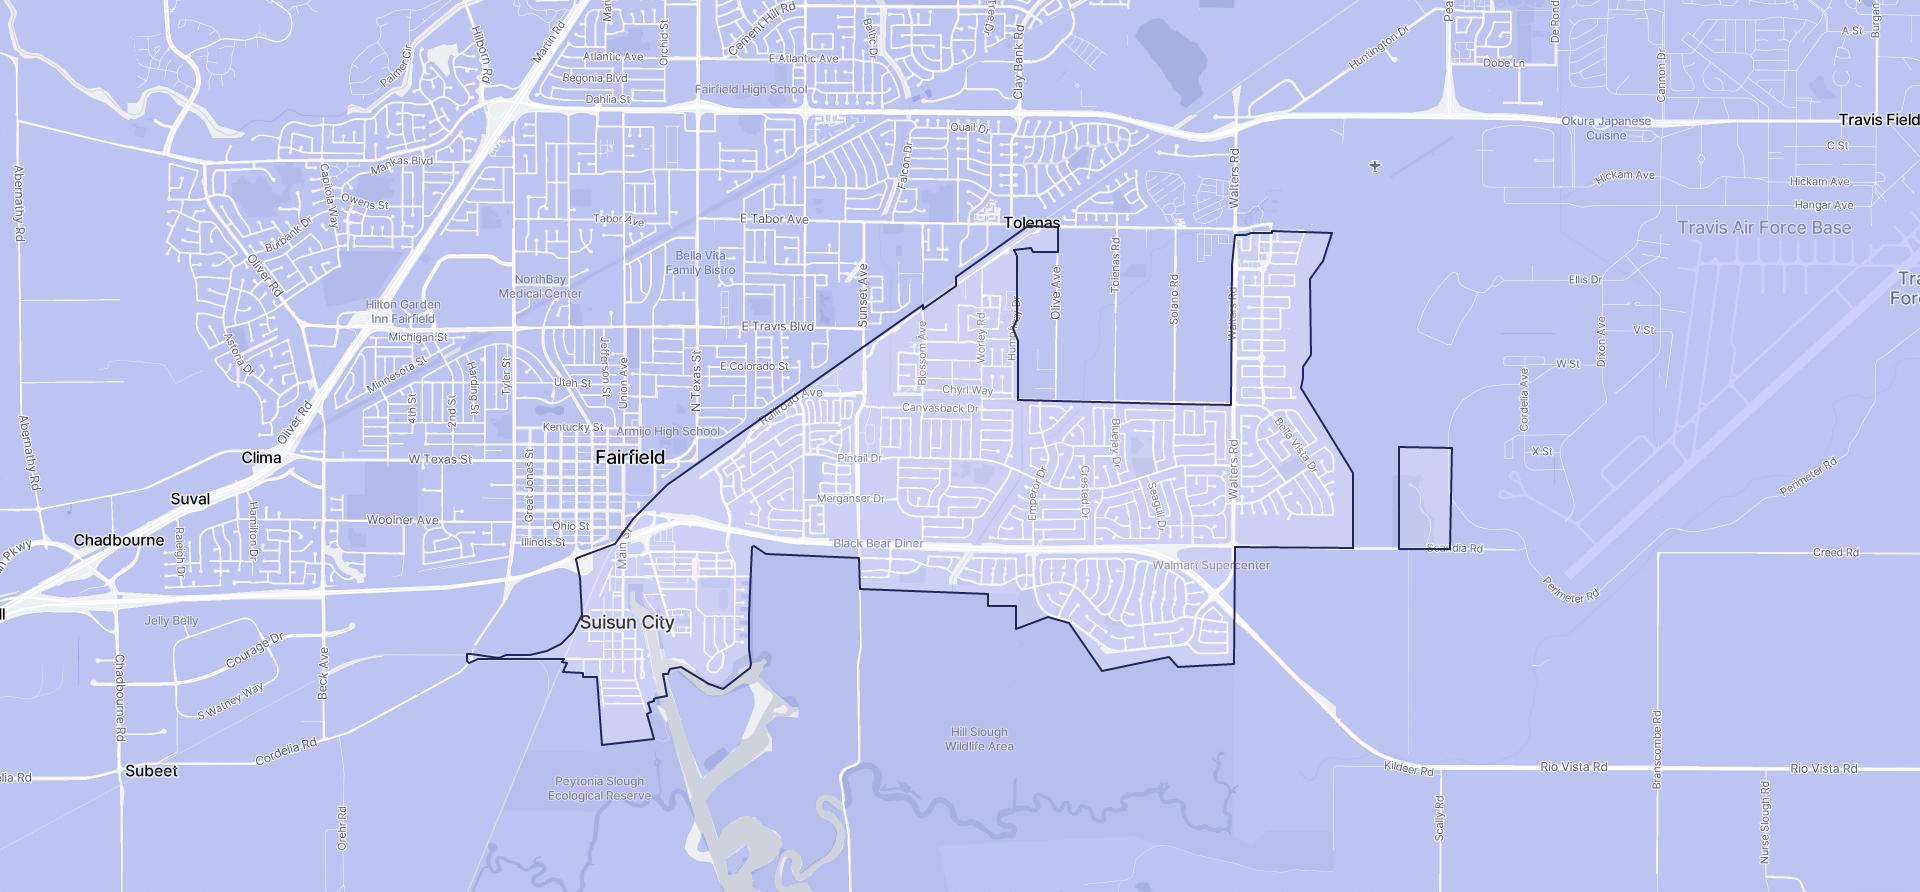 Image of Suisun City boundaries on a map.